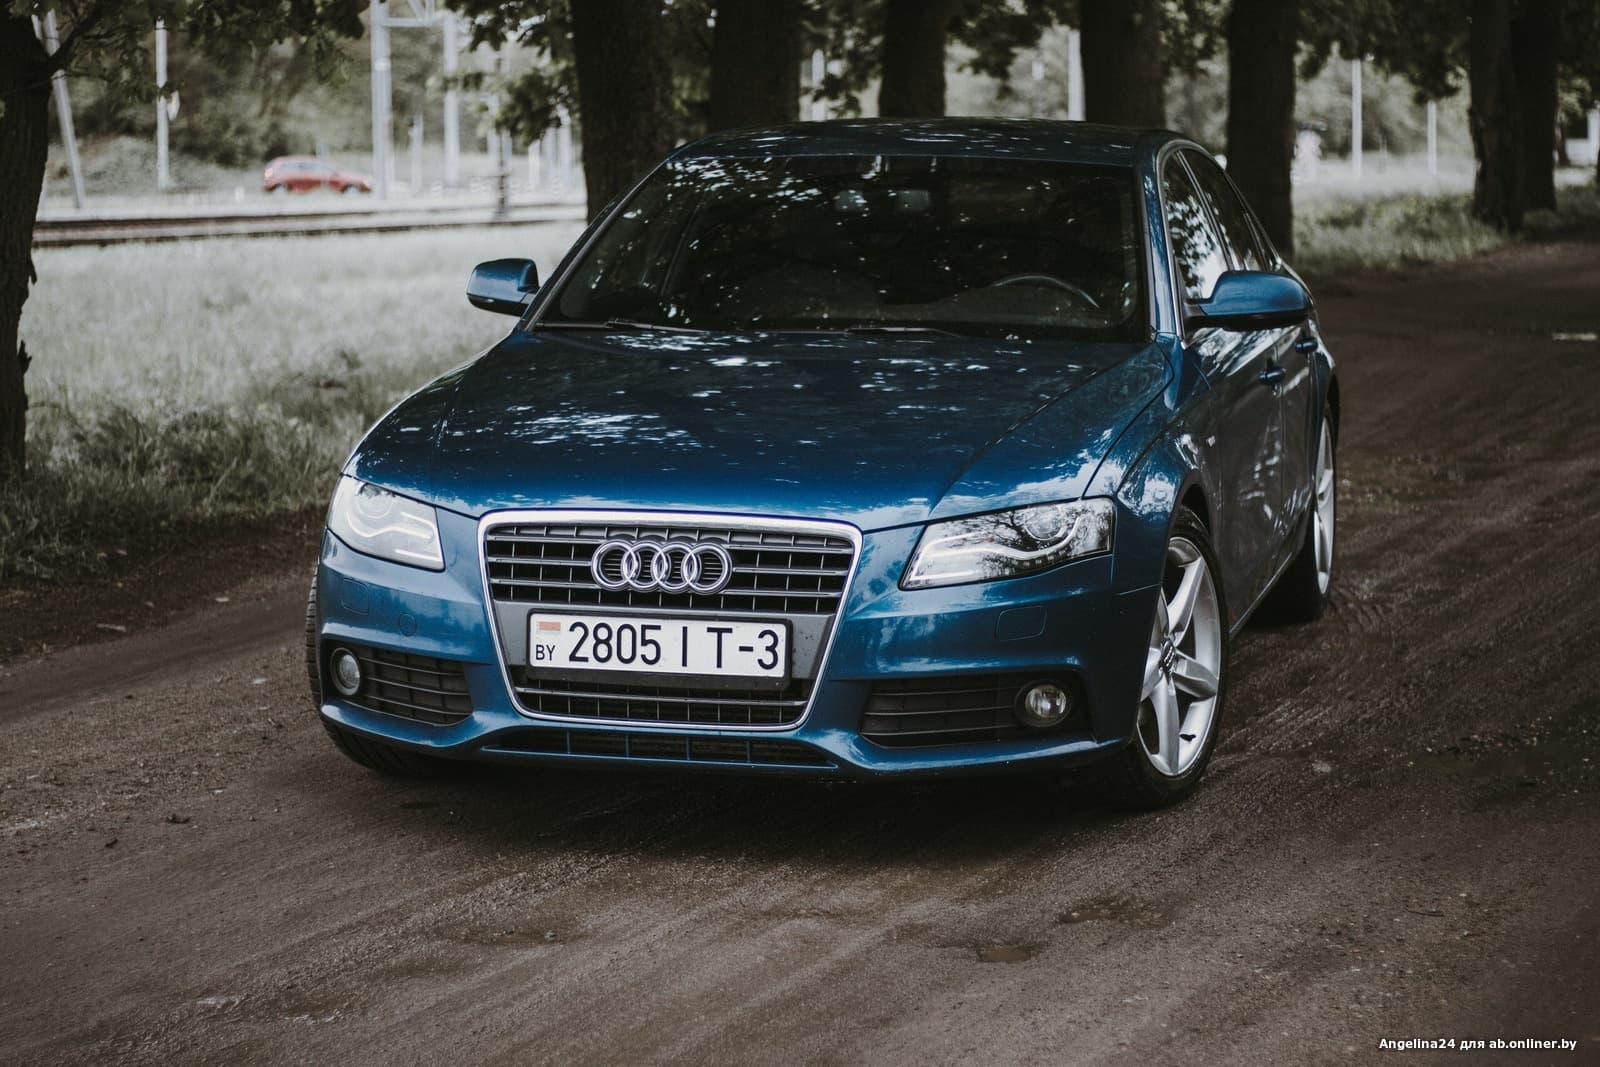 Audi A4 B8 S-line